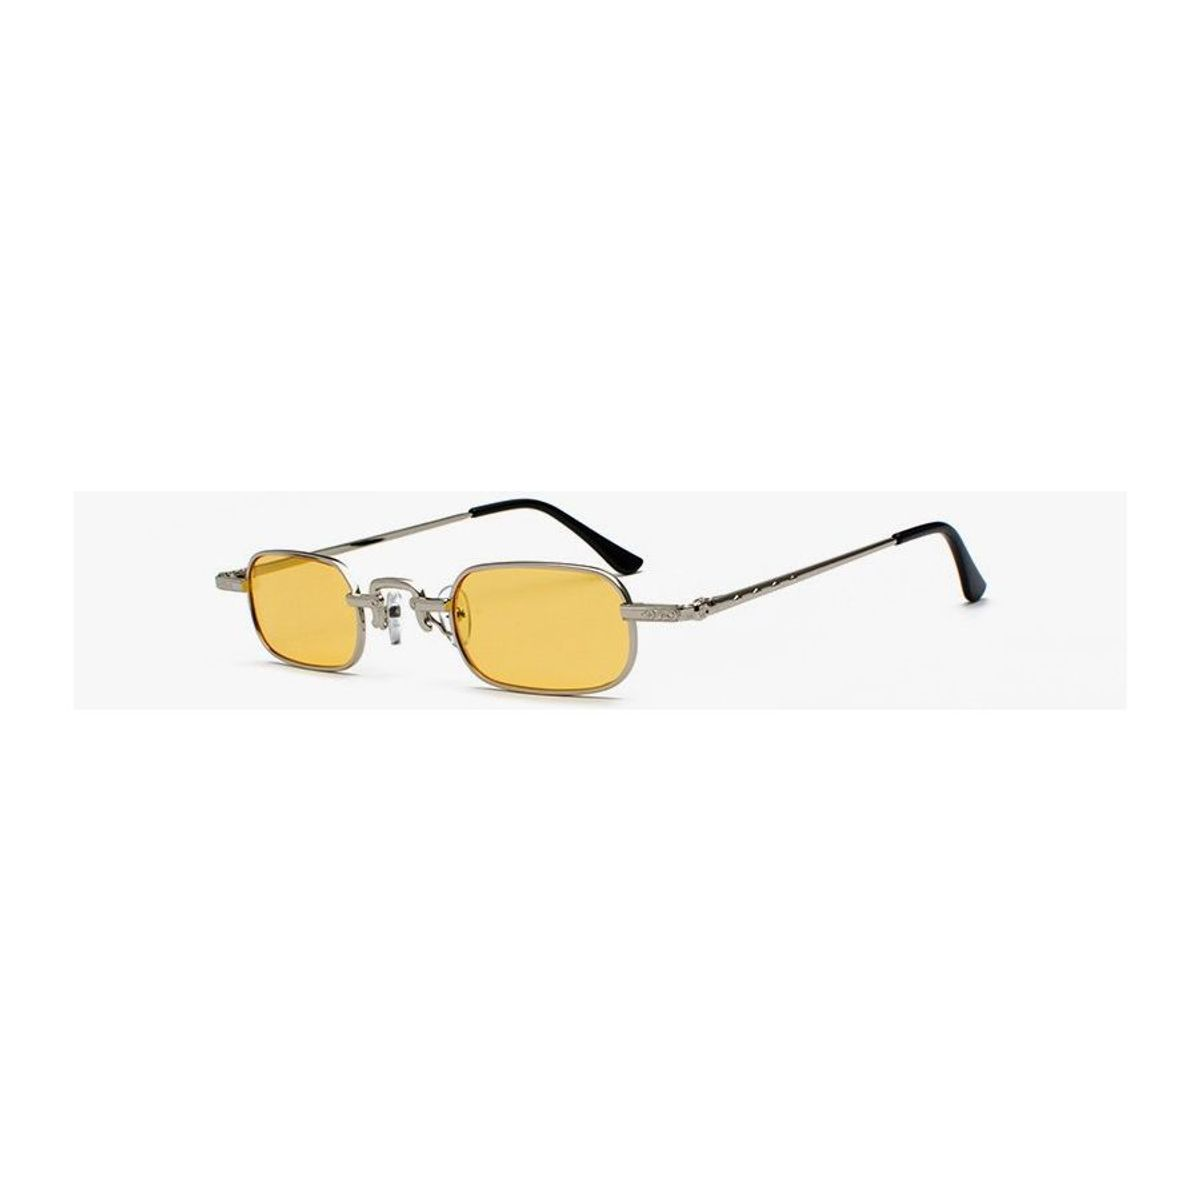 9bc6d8592 Óculos de Sol Milão / Retangular Retrô Vintage Metal Prata Mini Slim  Pequeno Lente Amarela | Óculos Feminino Nunca Usado 34009312 | enjoei